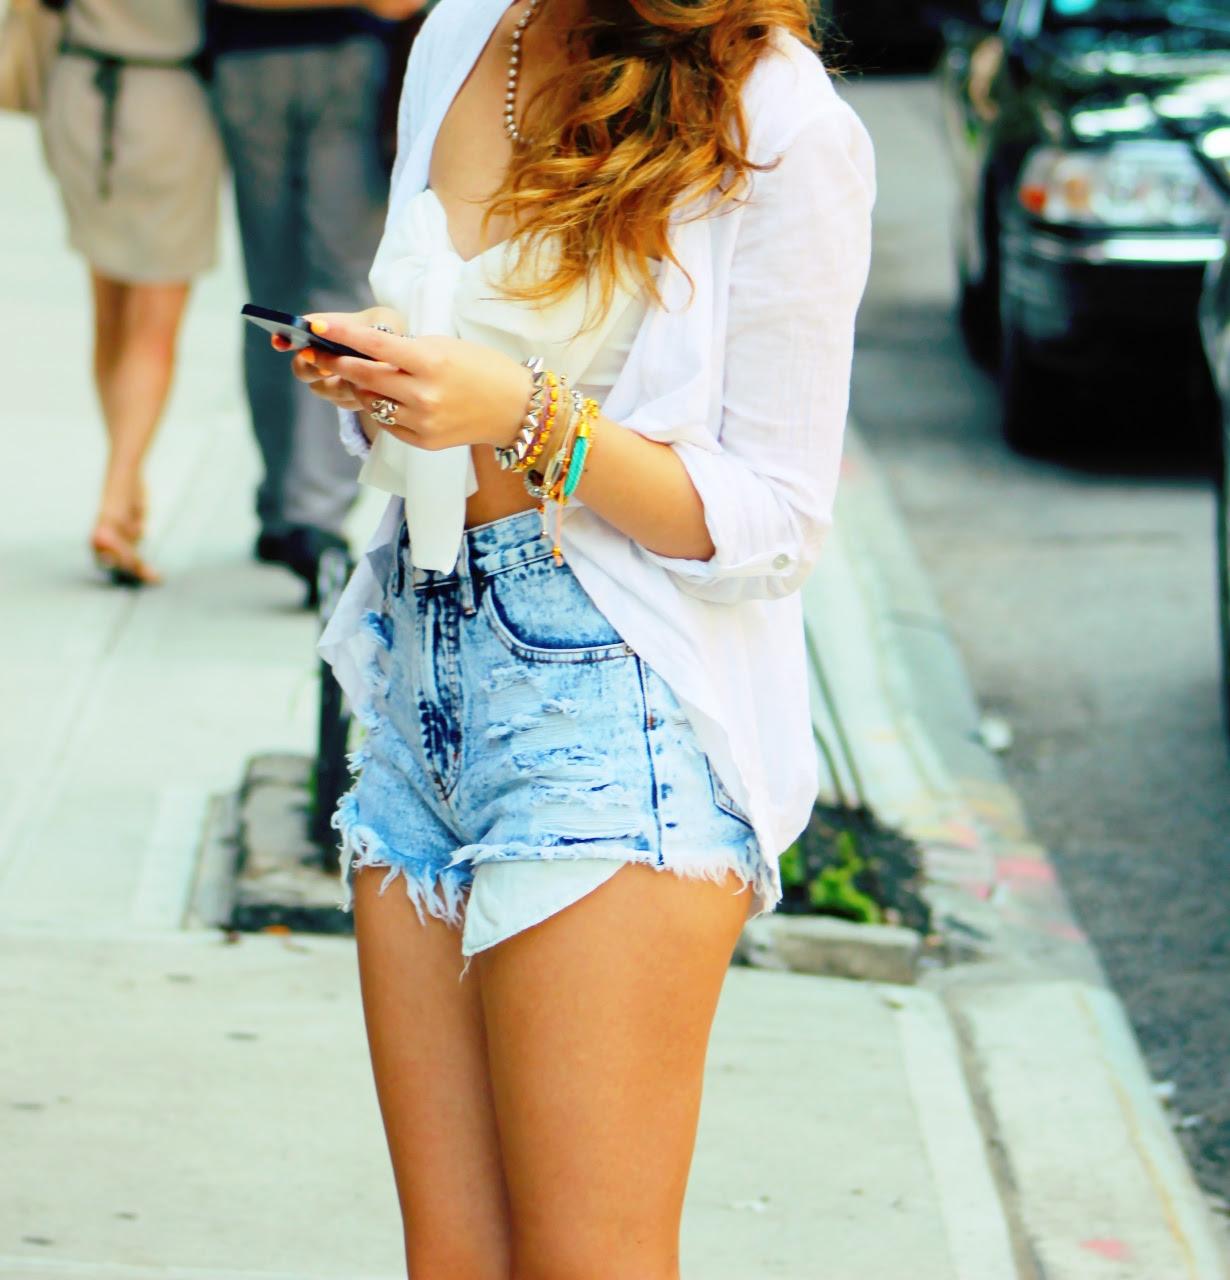 http://fashionhotbox.com/wp-content/uploads/2013/08/photo-16.jpg